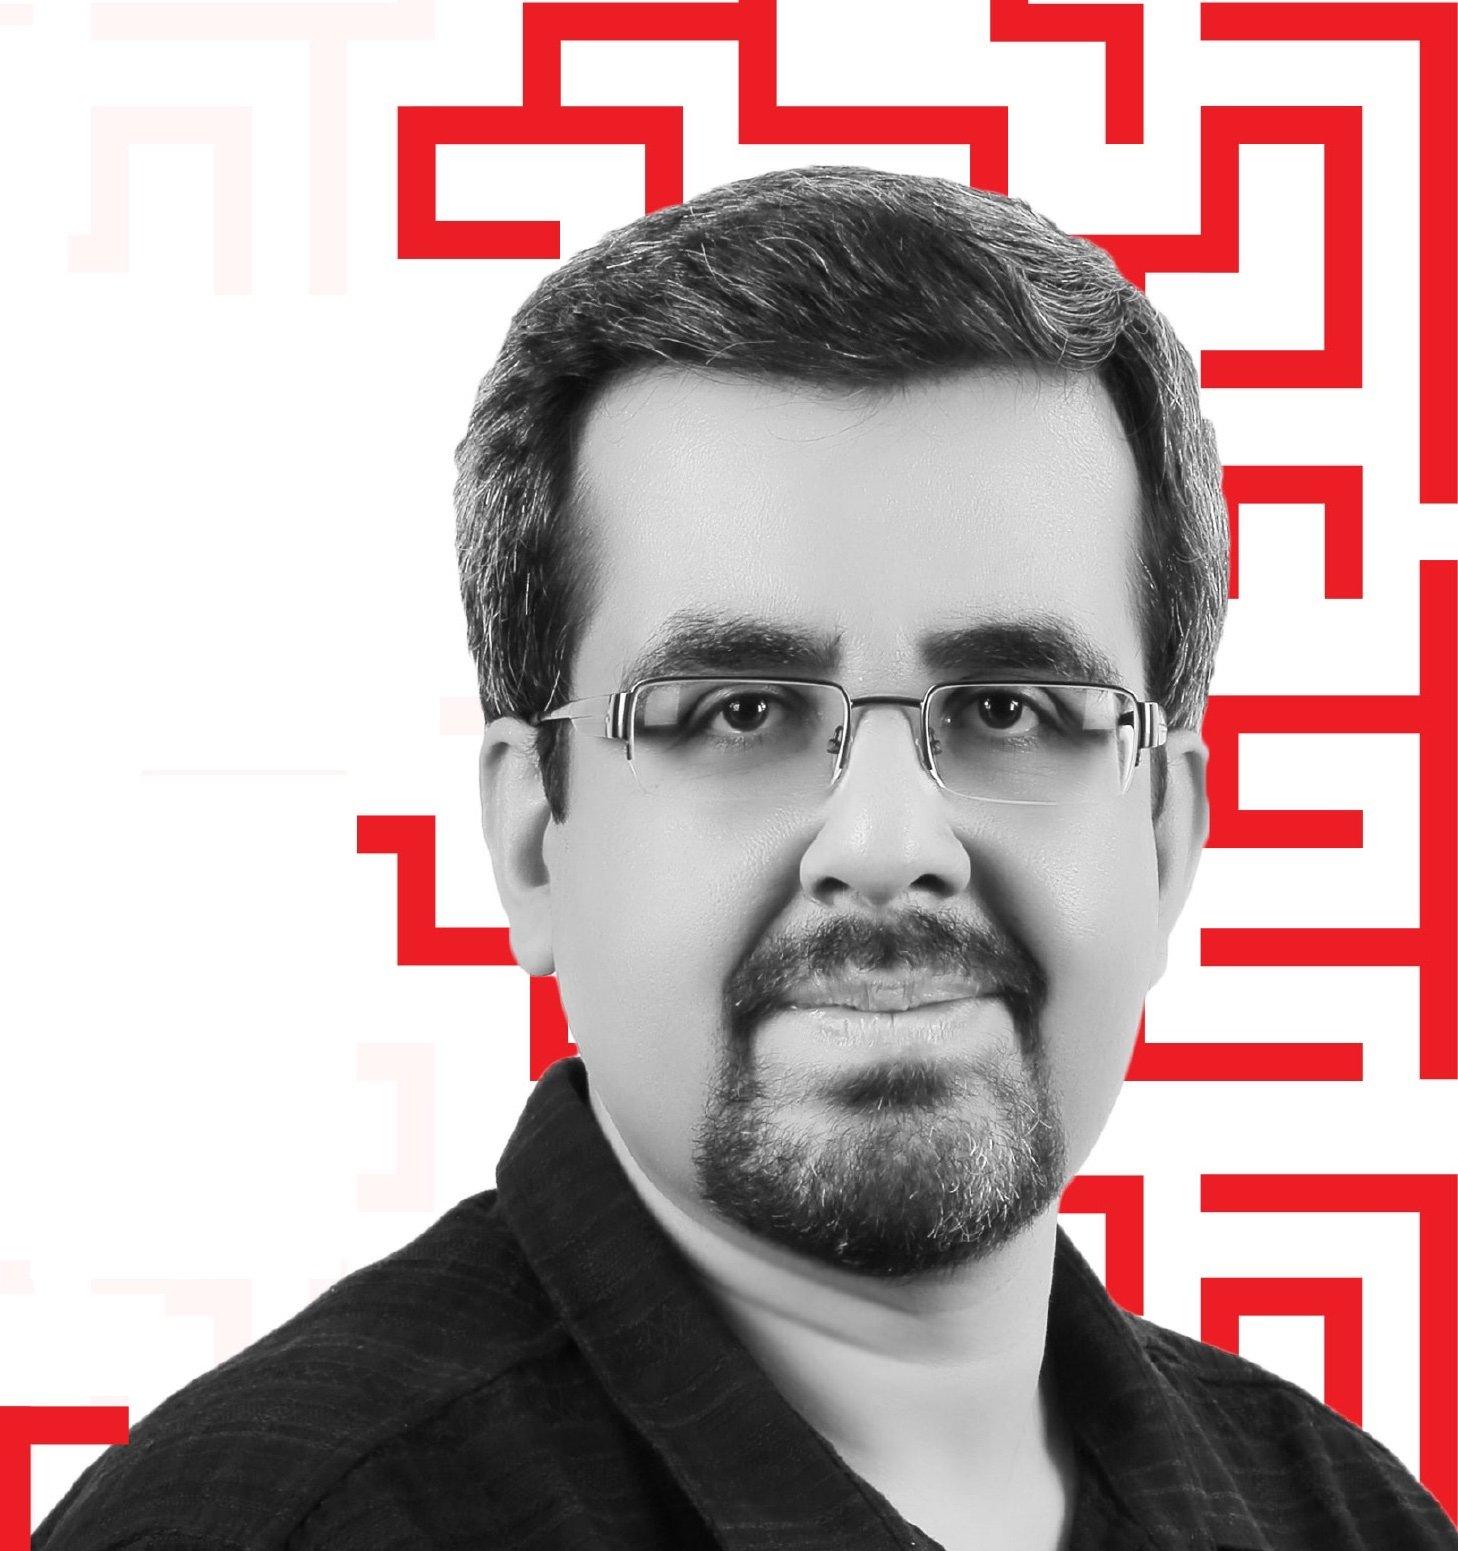 دکتر حمیدرضا کشاورز محمدیان